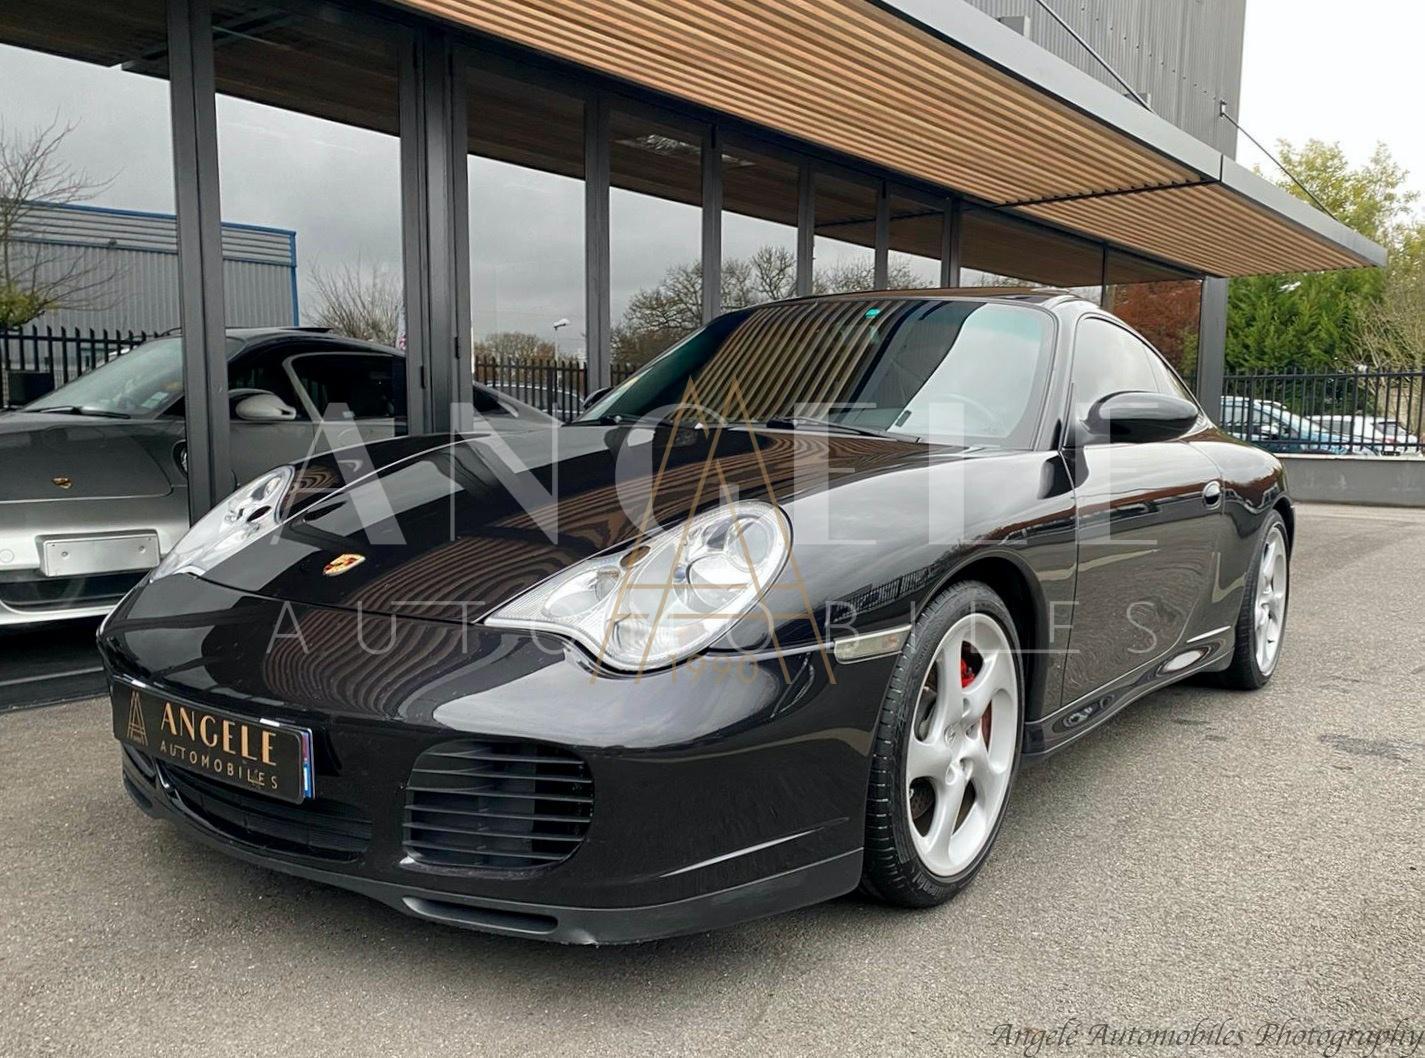 PORSCHE 996 - Angelé Automobiles